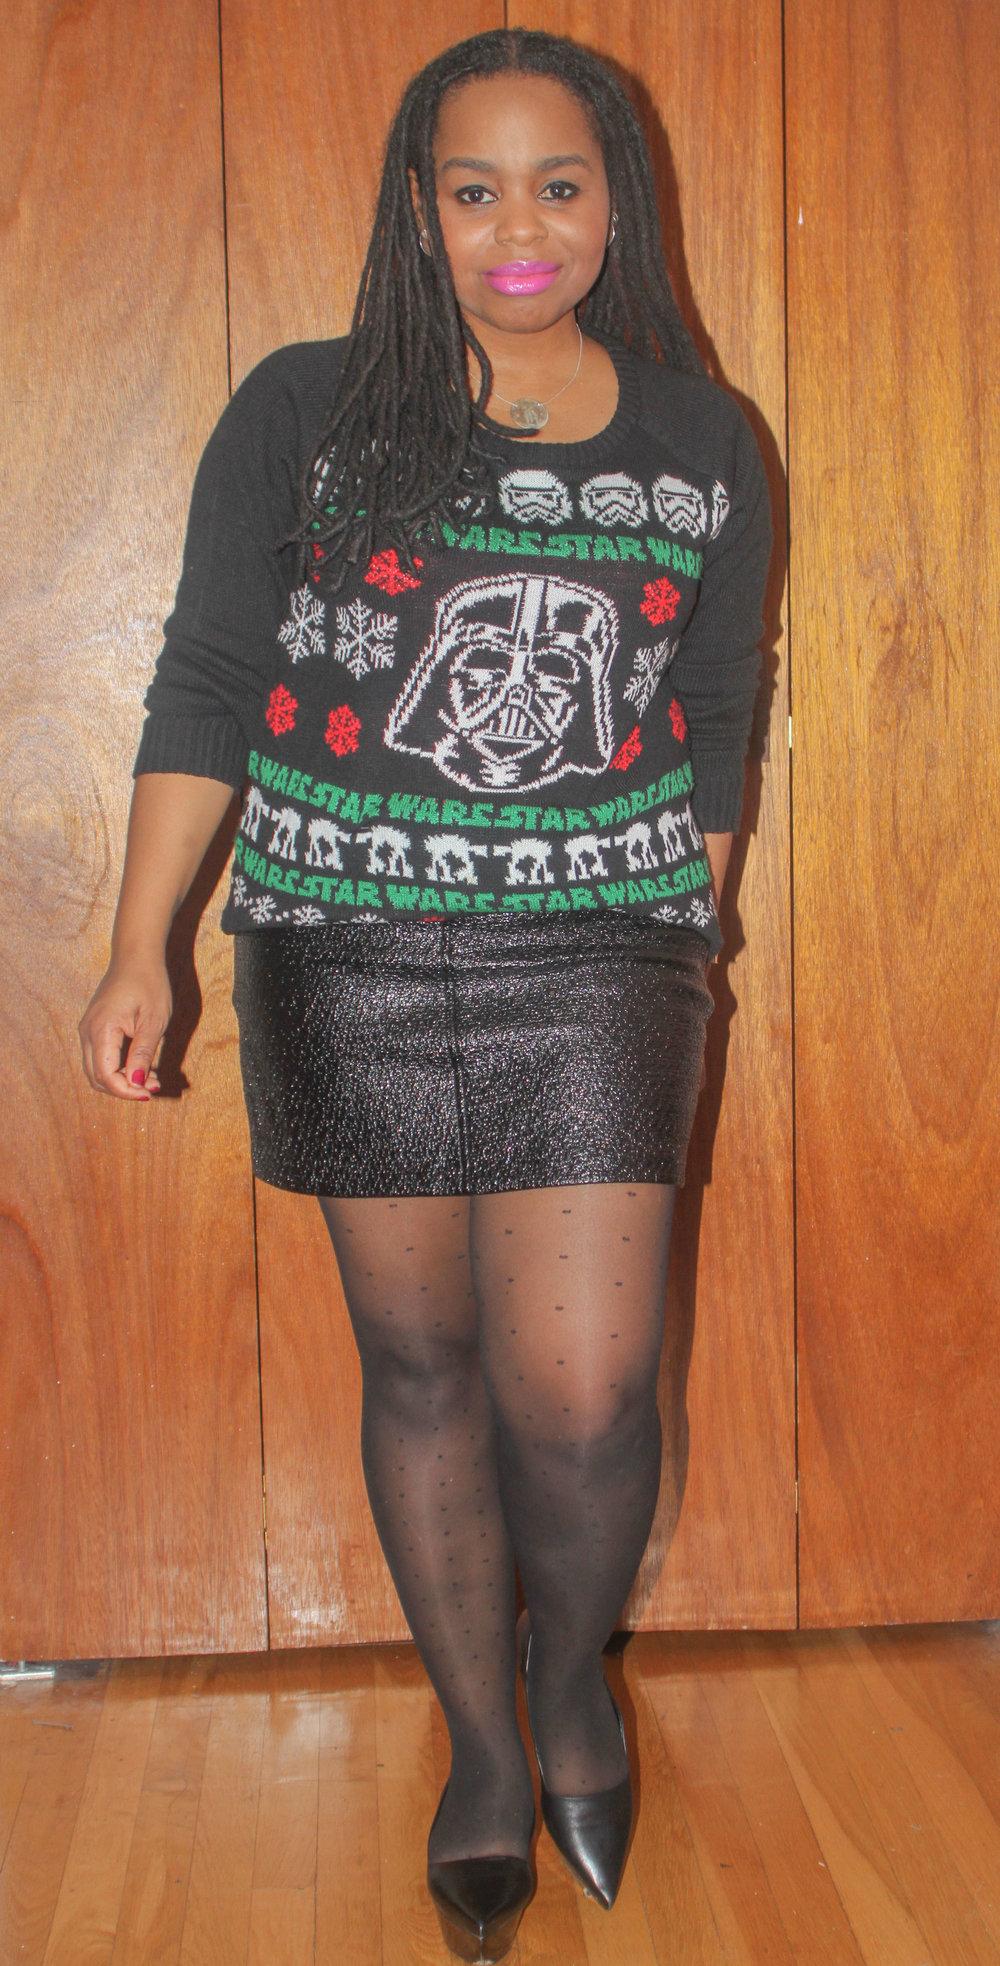 Mini Skirt: Zara Sheer Dot Tights: Ann Taylor Shoes: Jil Sander purchased at Fox & Fawn Bushwick